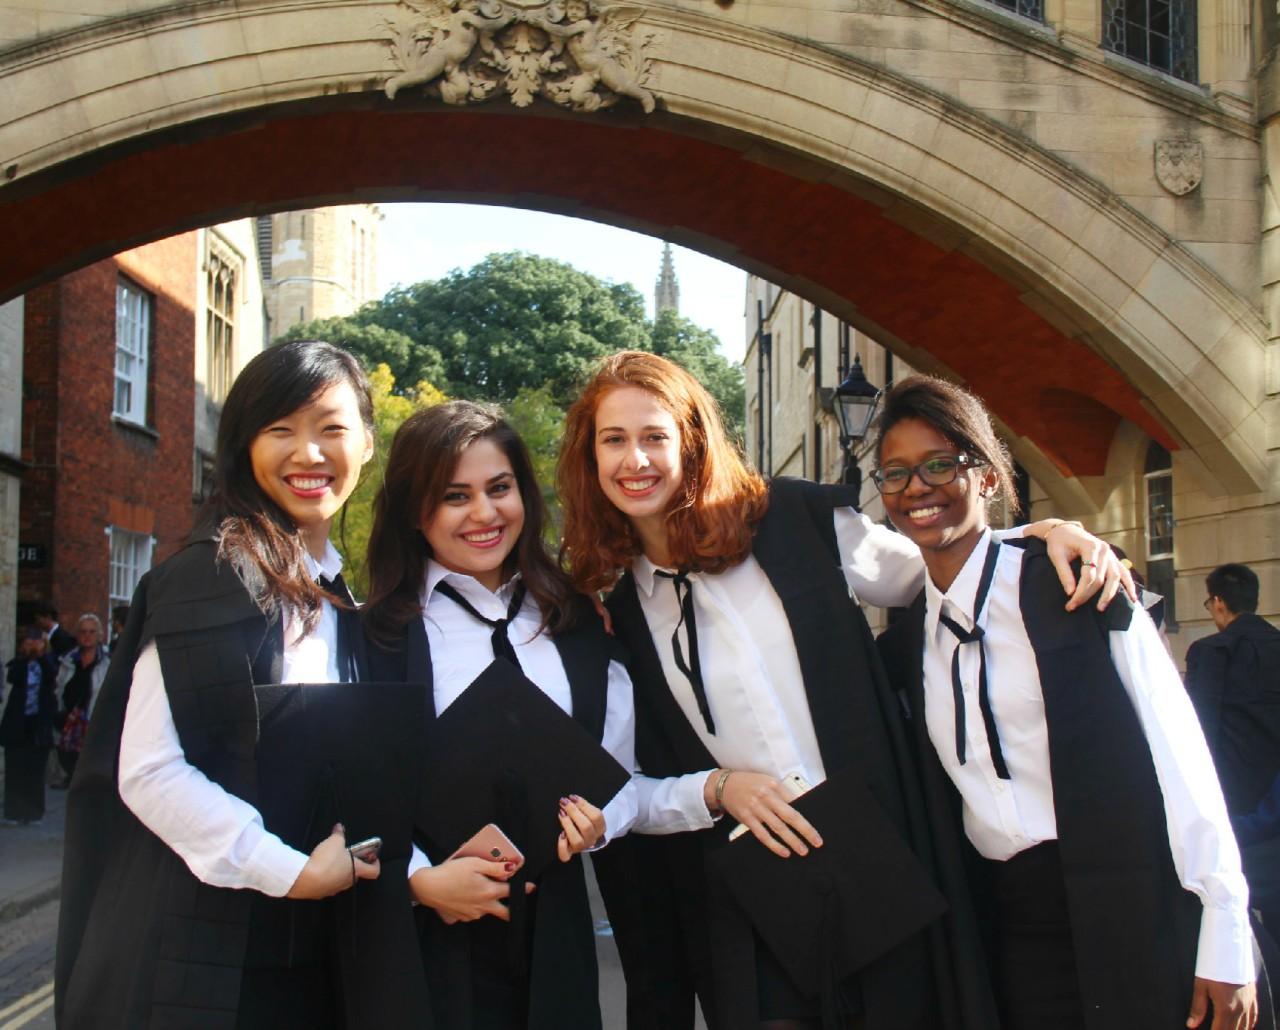 Angleterre: Elixir de jeunesse àOxford